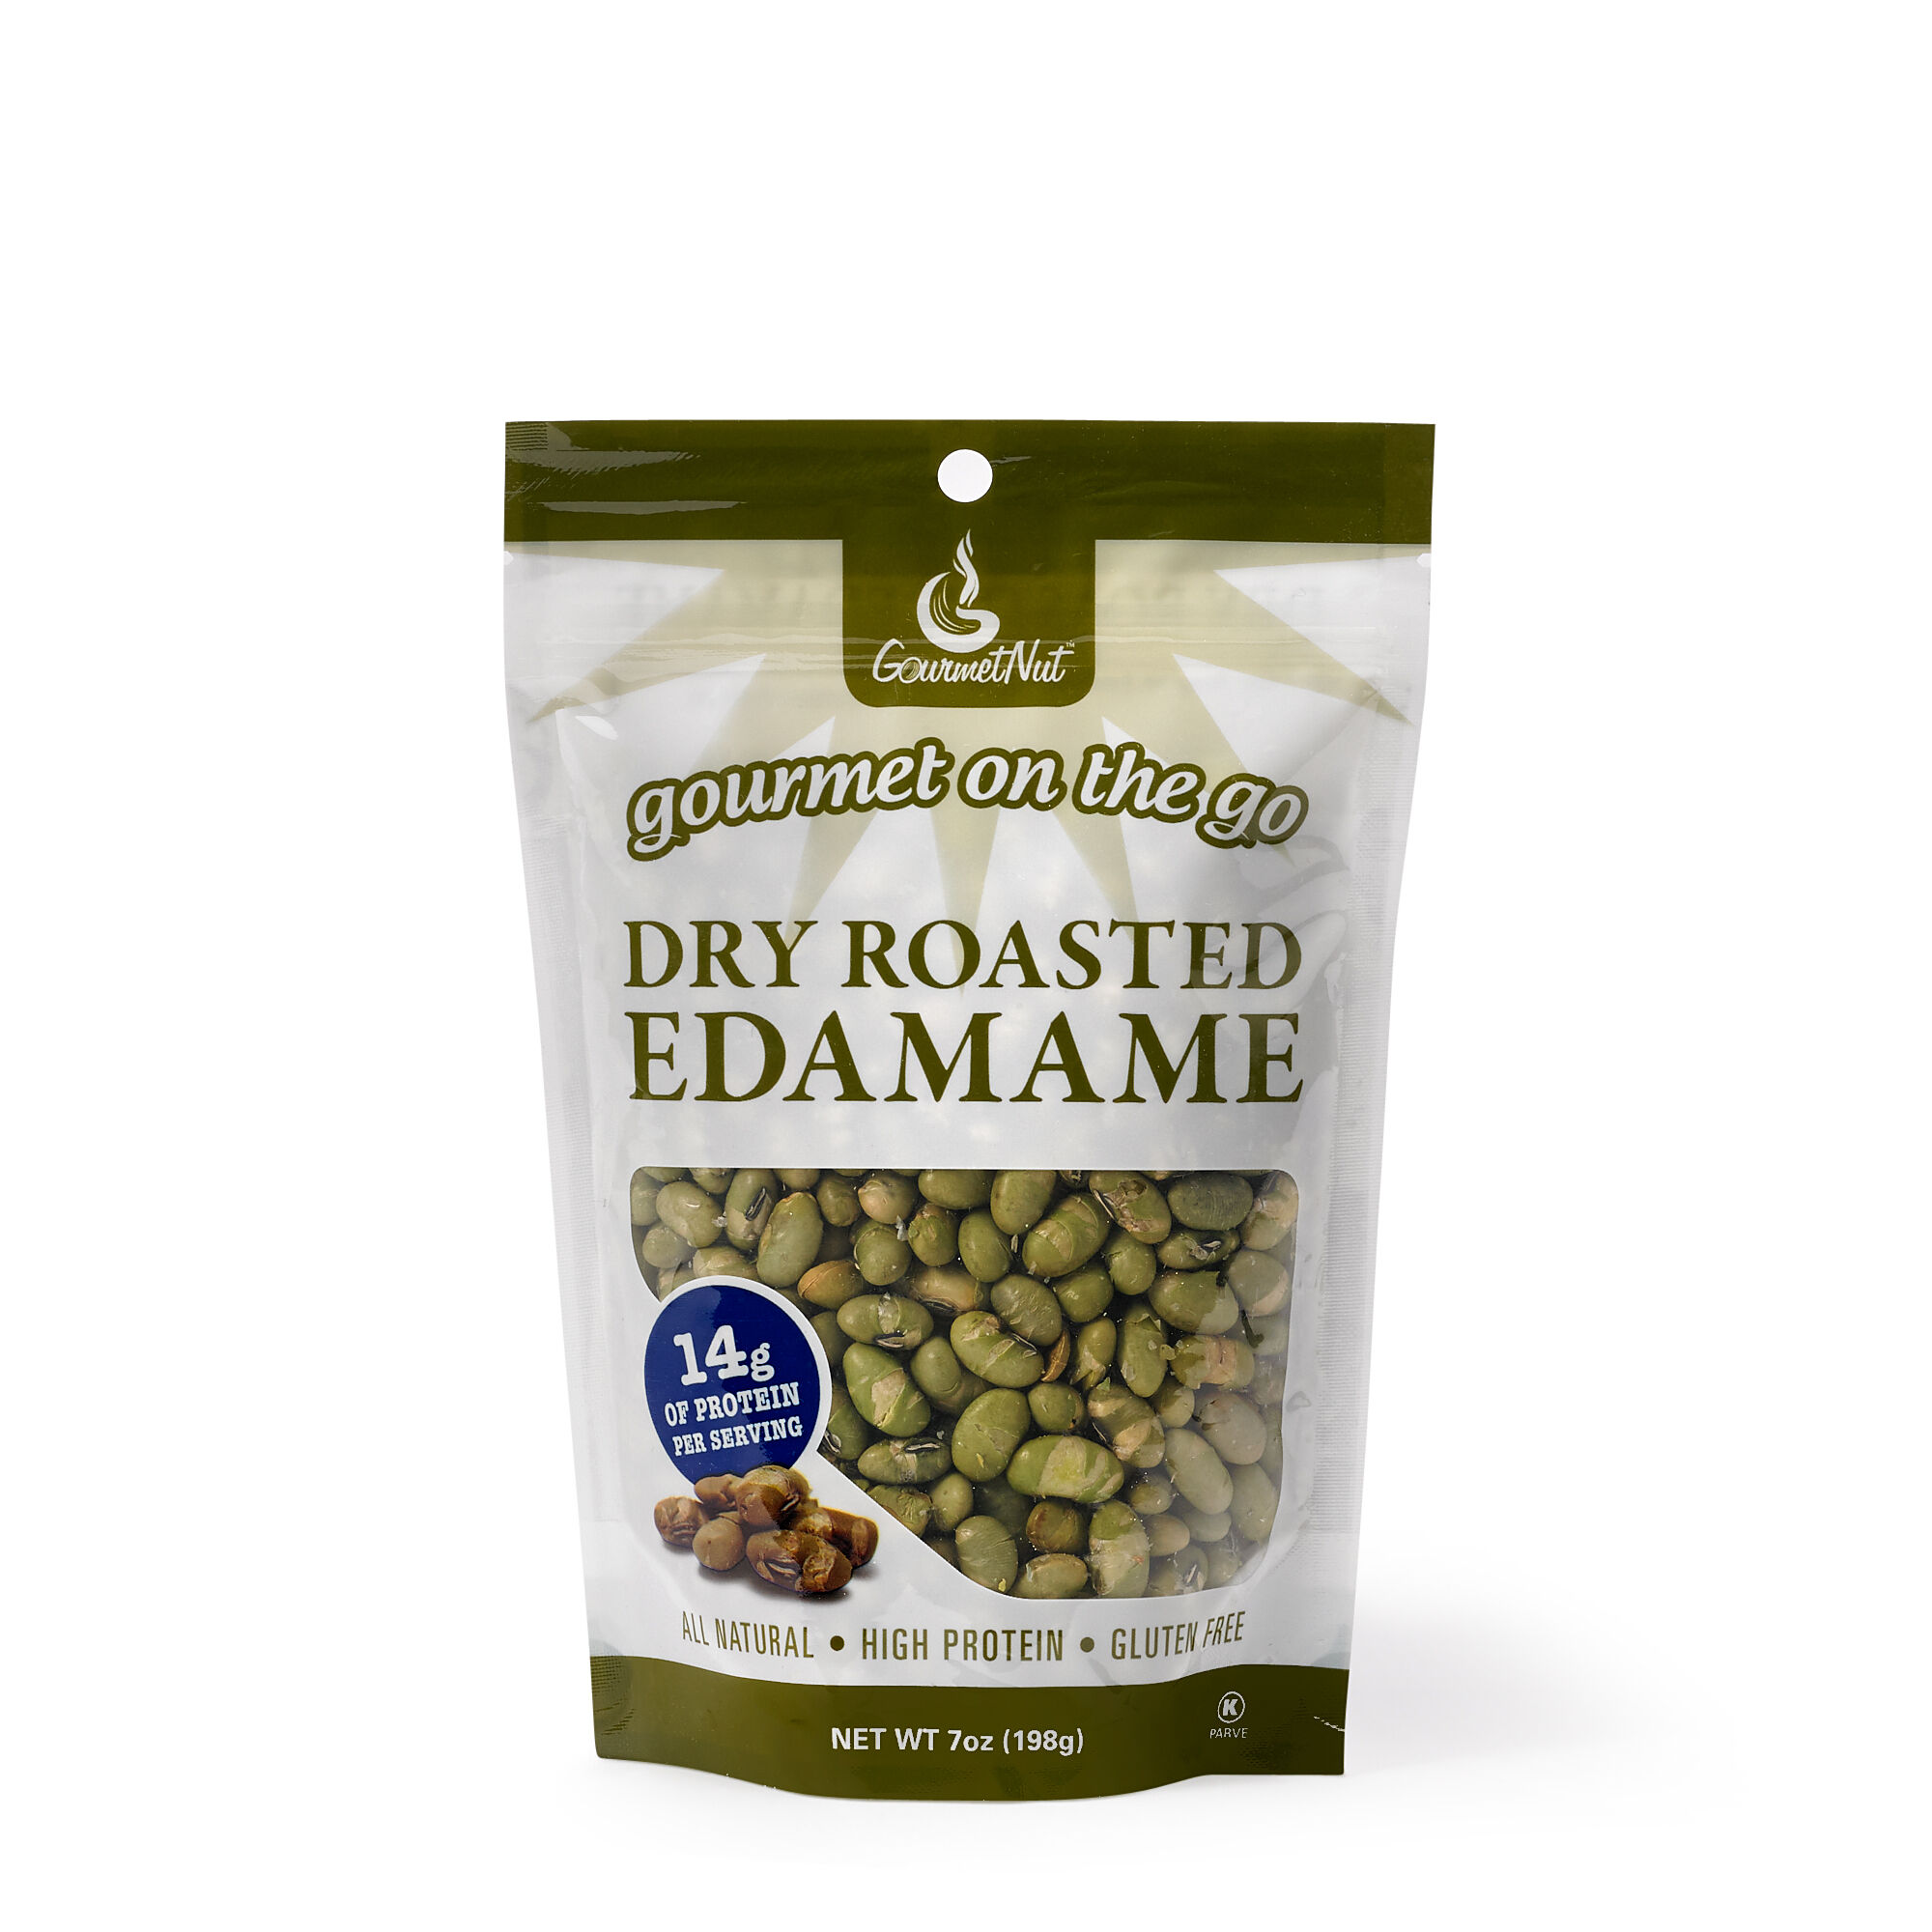 GourmetNut™ Dry Roasted Edamame | GNC